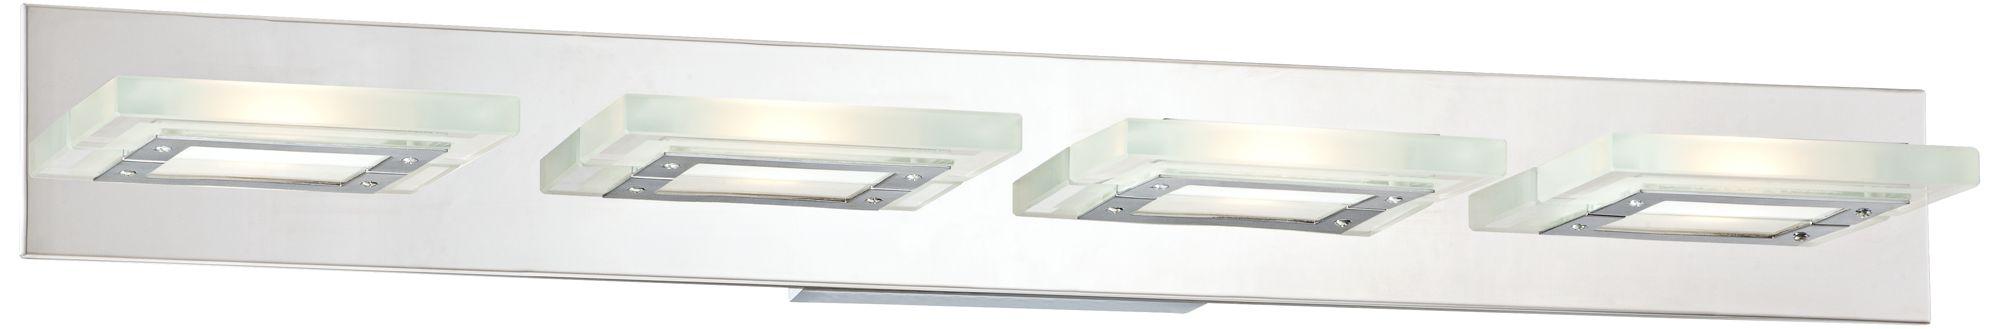 Possini Euro Emilio 36 1/2  Wide Chrome LED Bath Light  sc 1 st  L&s Plus & LED Bathroom Lighting - LED Vanity Lights and Light Bars | Lamps Plus azcodes.com